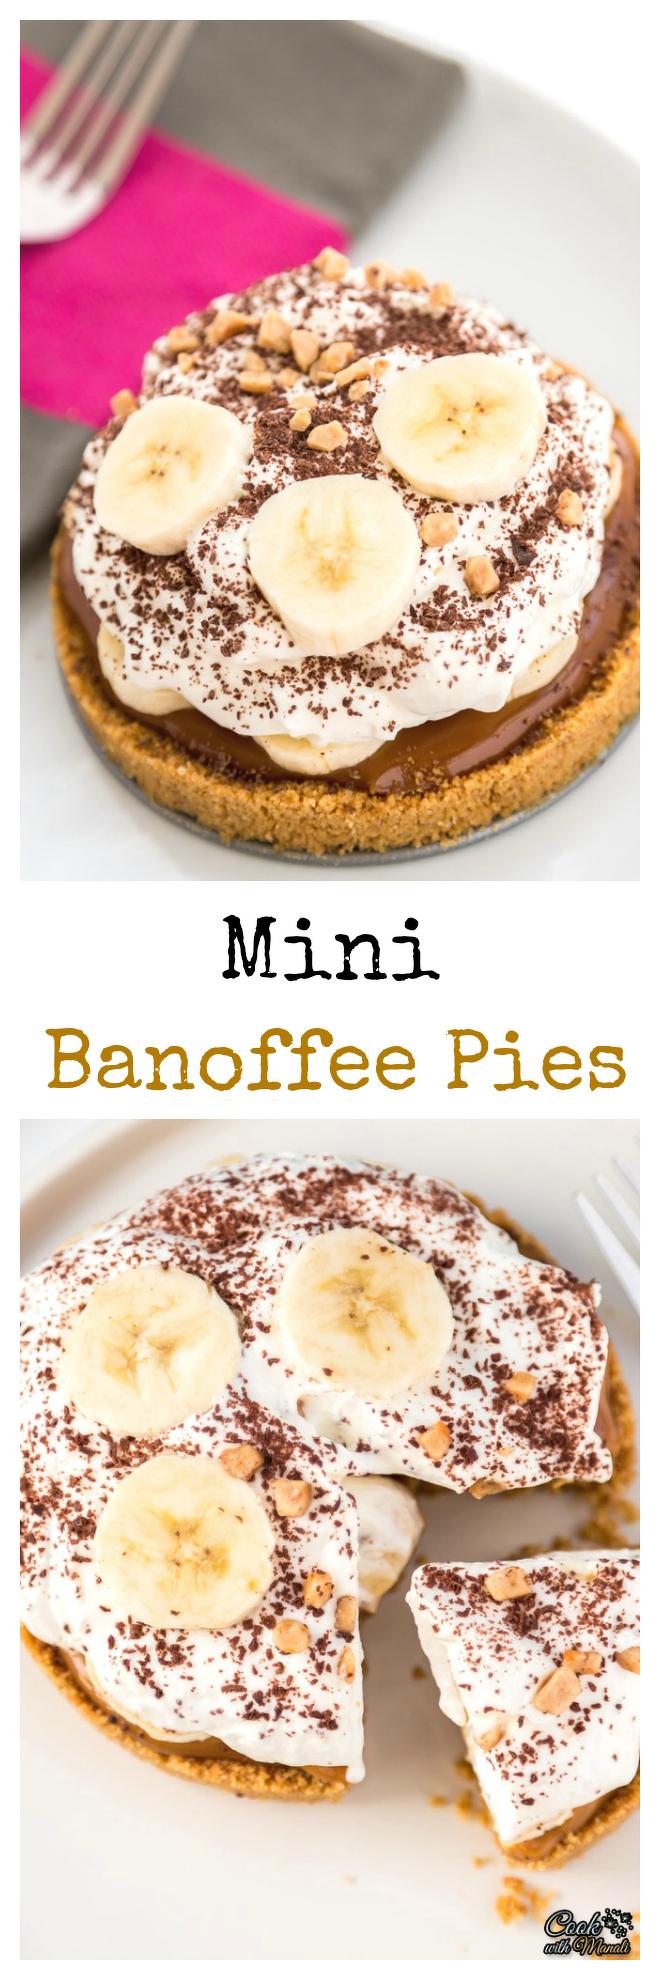 Mini Banoffee Pies Collage-nocwm